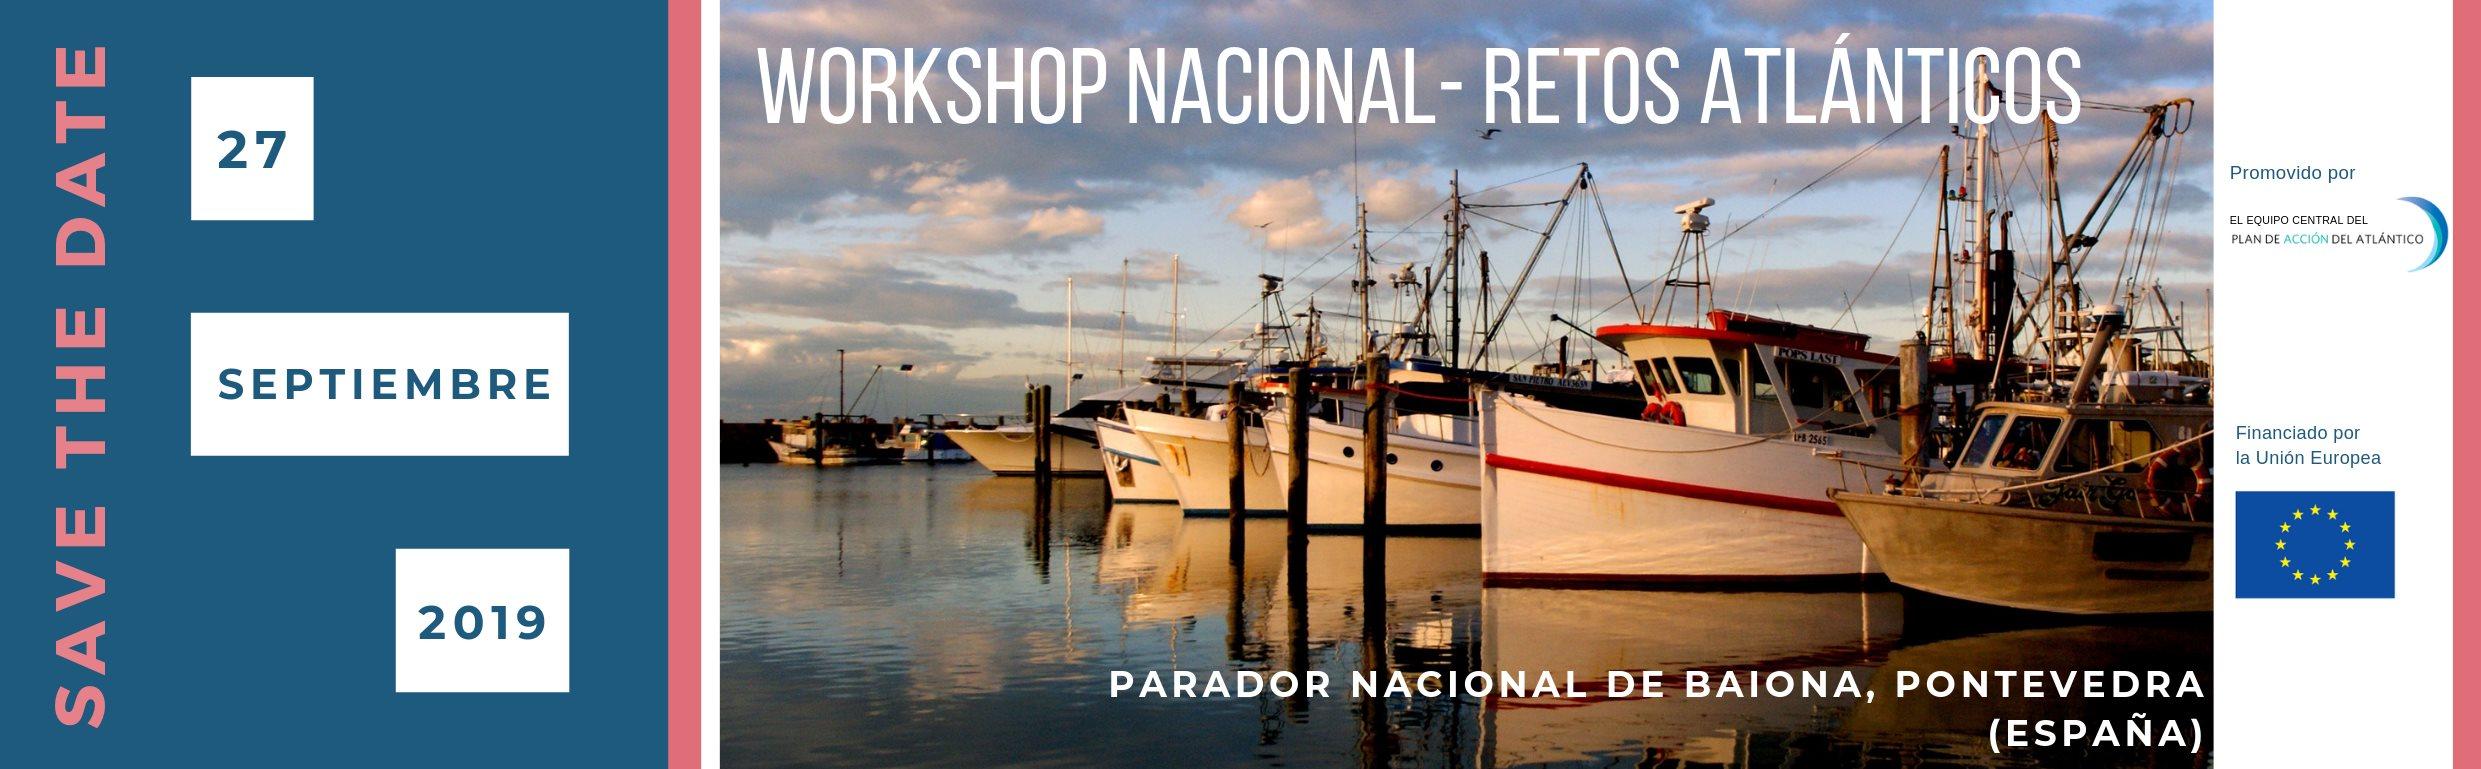 workshop retos atlánticos, nodo nacional, campus do mar